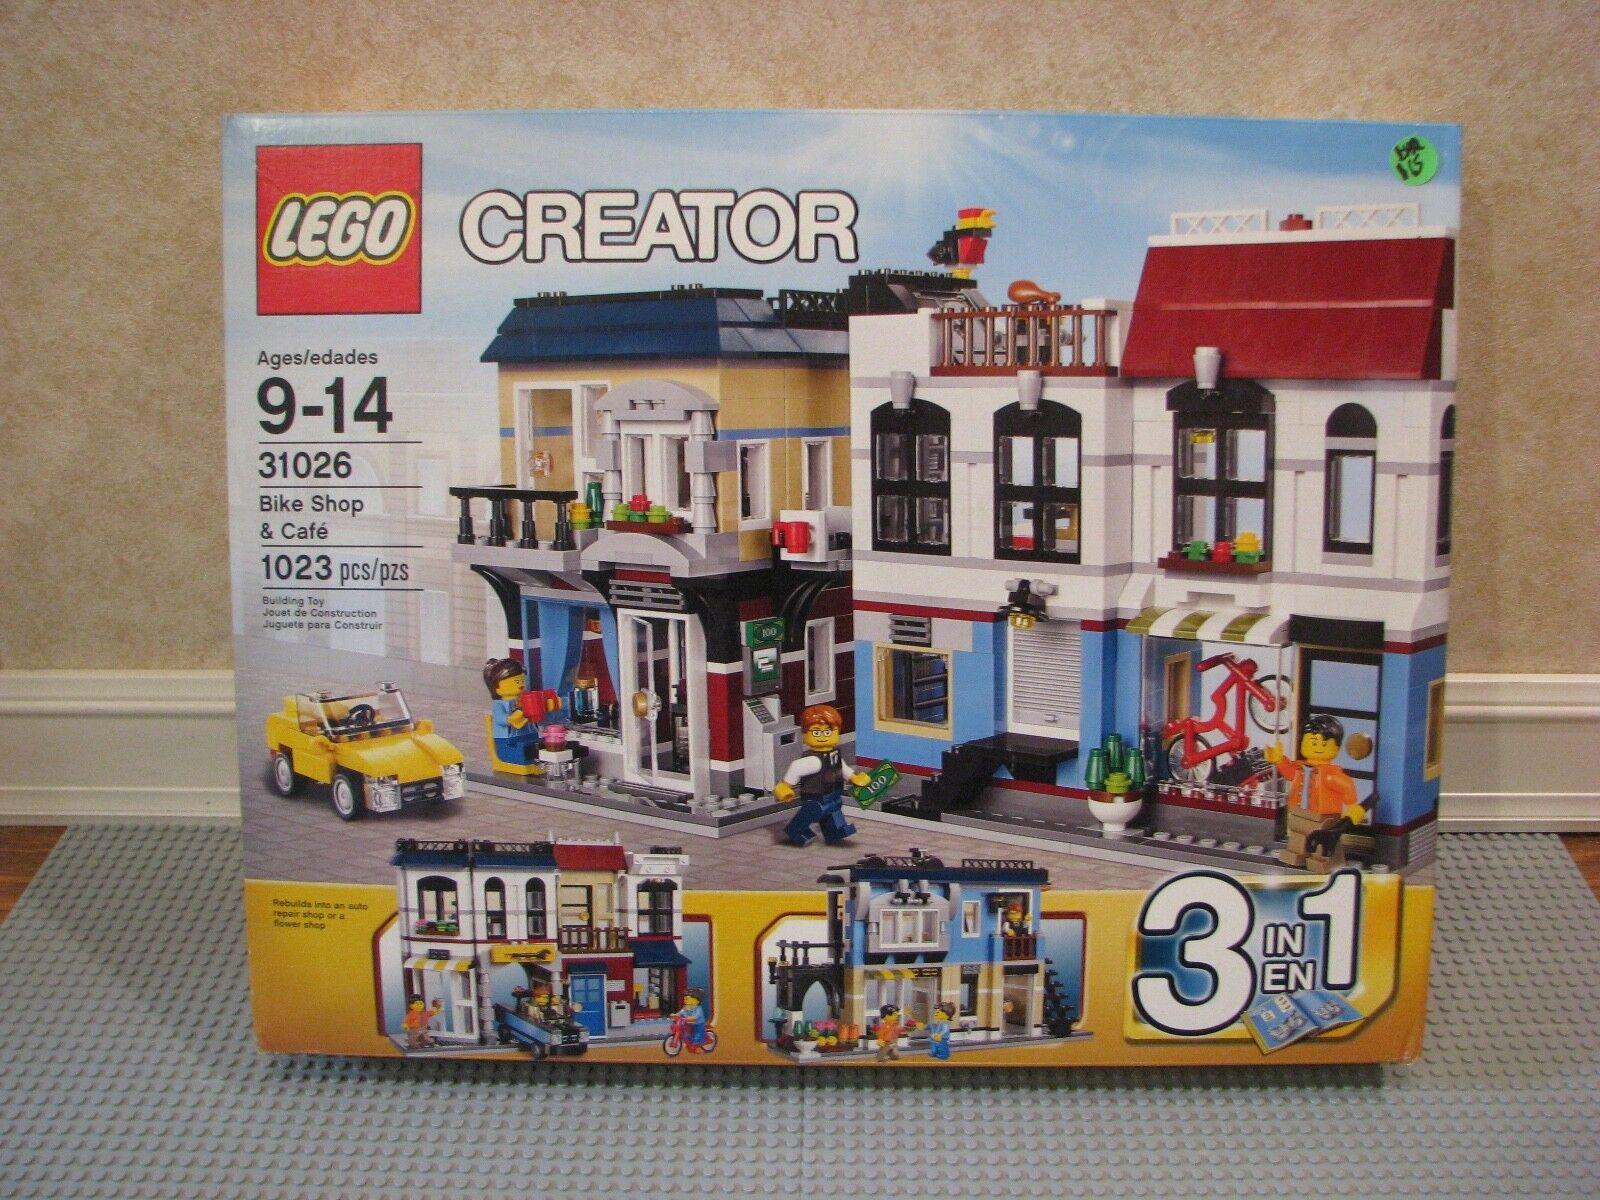 LEGO Creator Bike Shop & Café (31026) 100% all pieces, instructions, and box